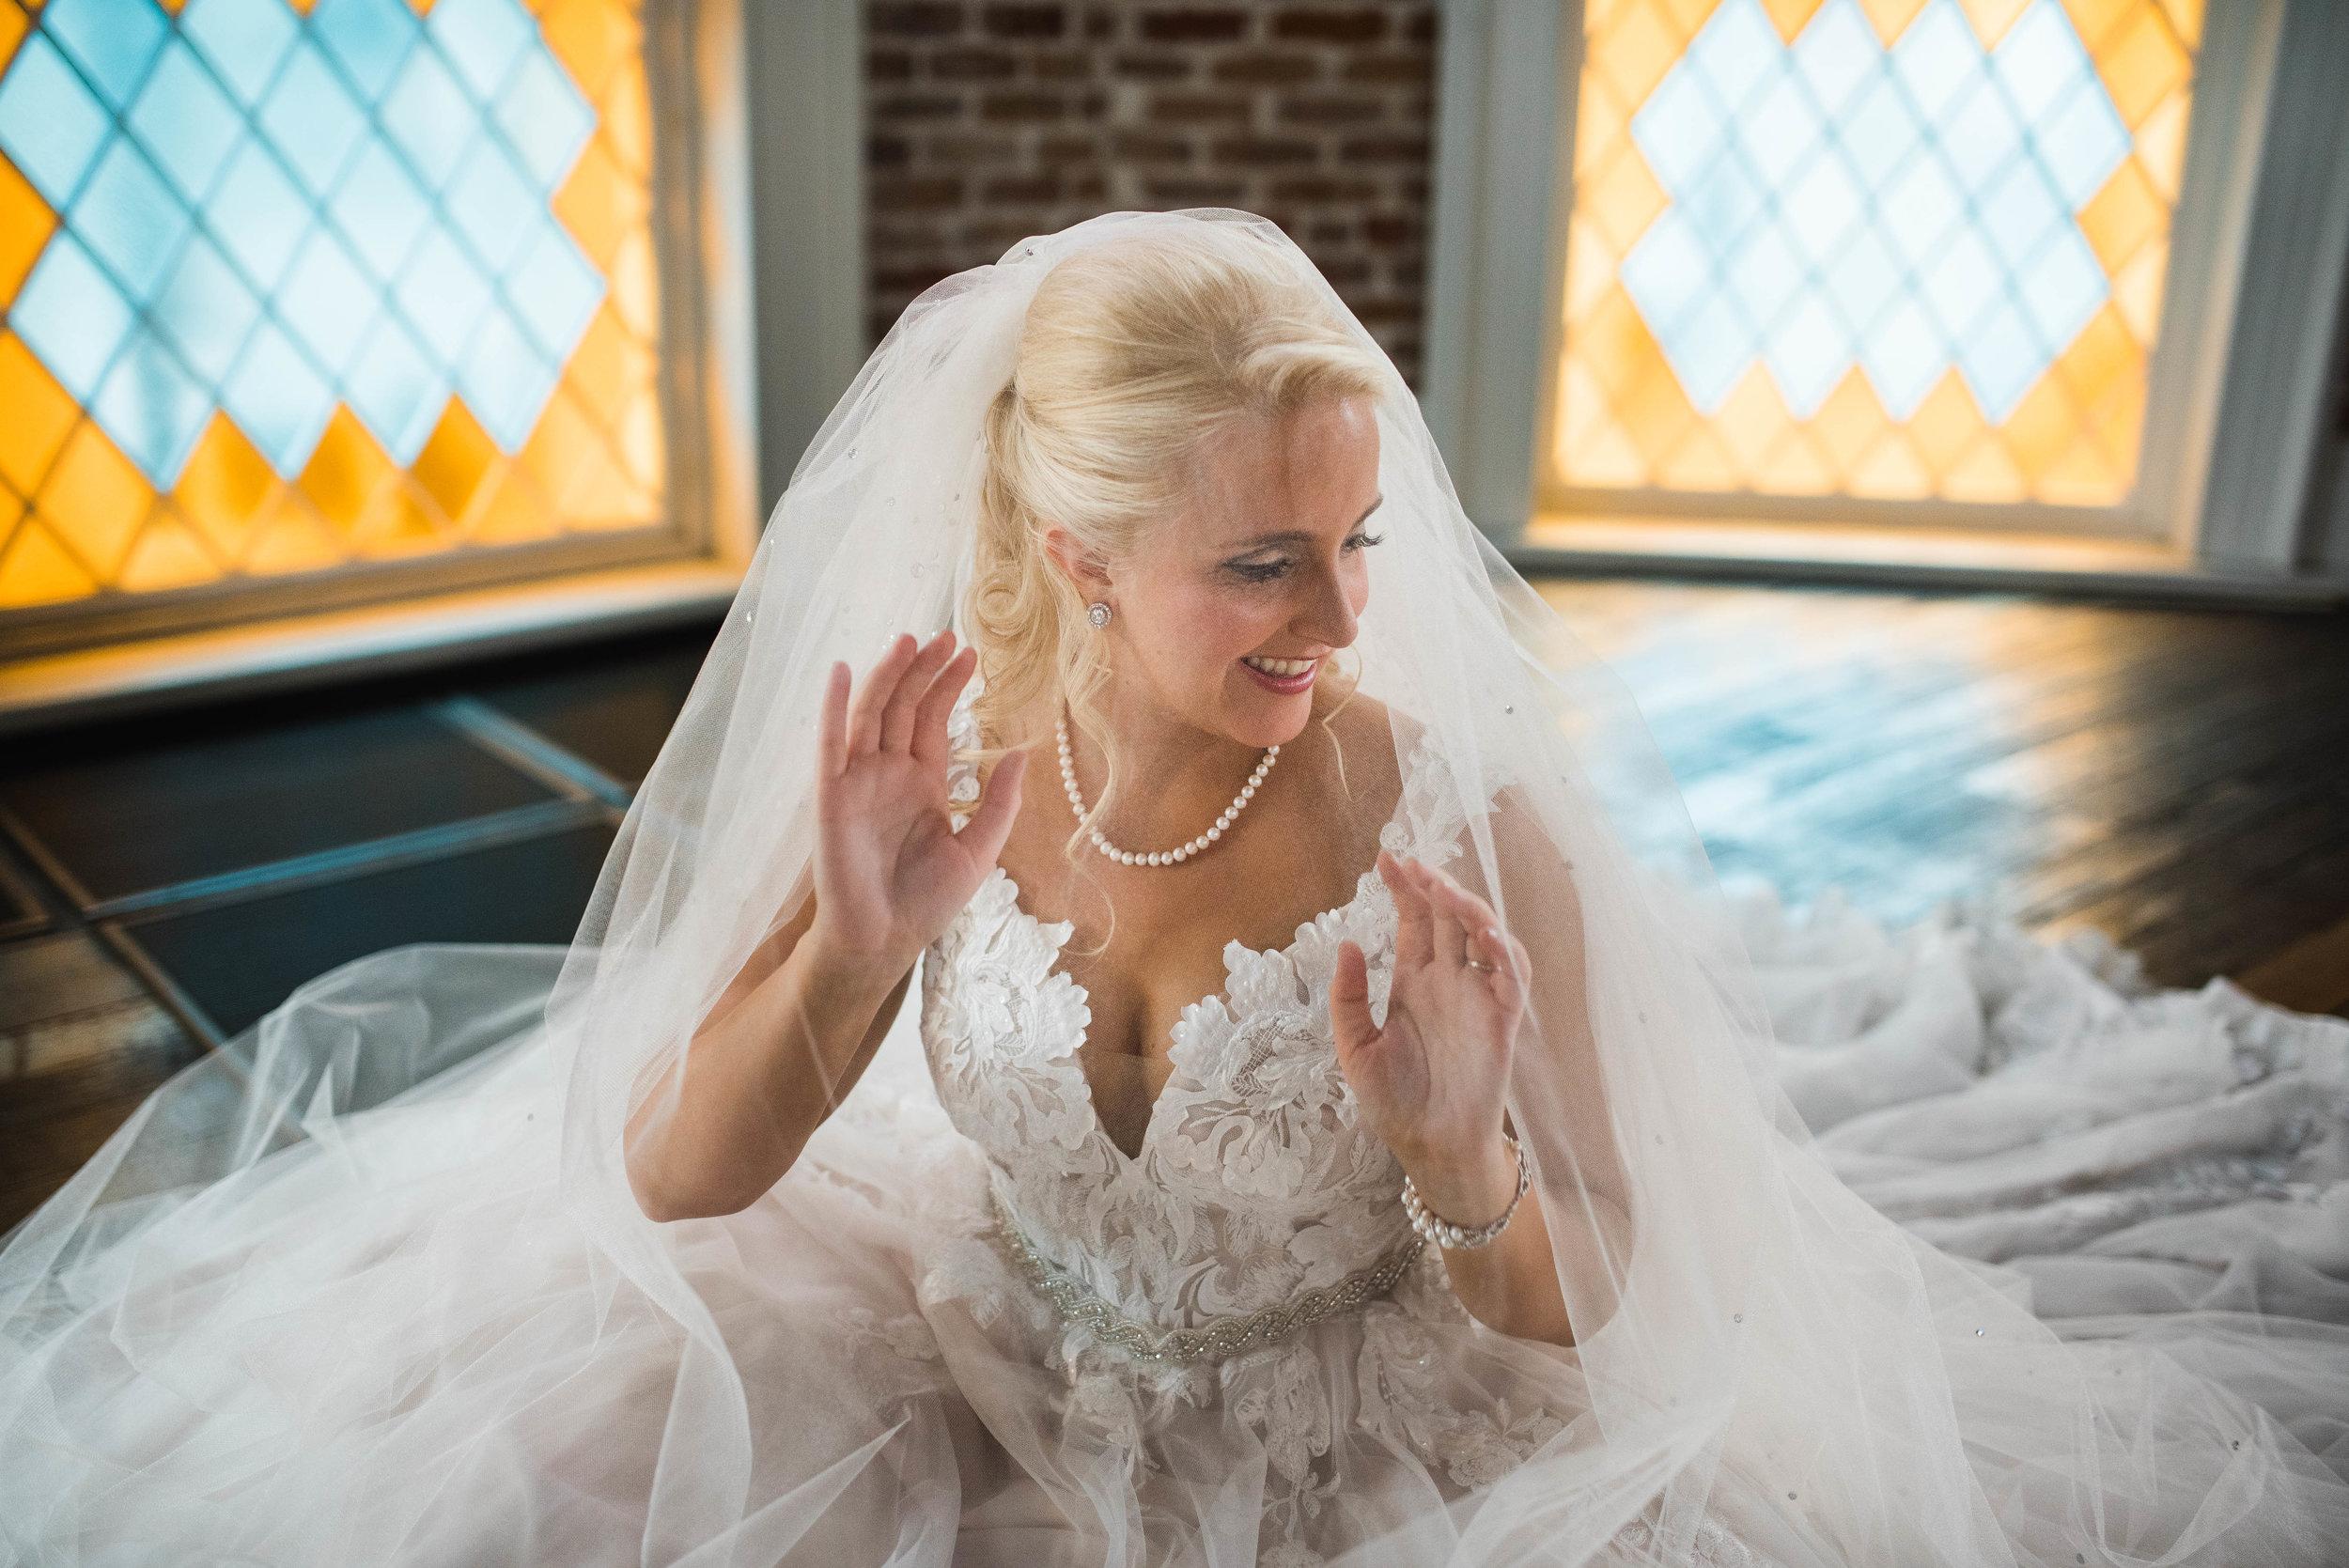 Kate-Felicity-Church-Bridal-Portraits_Gabby Chapin_Photography_Originals_00170.jpg